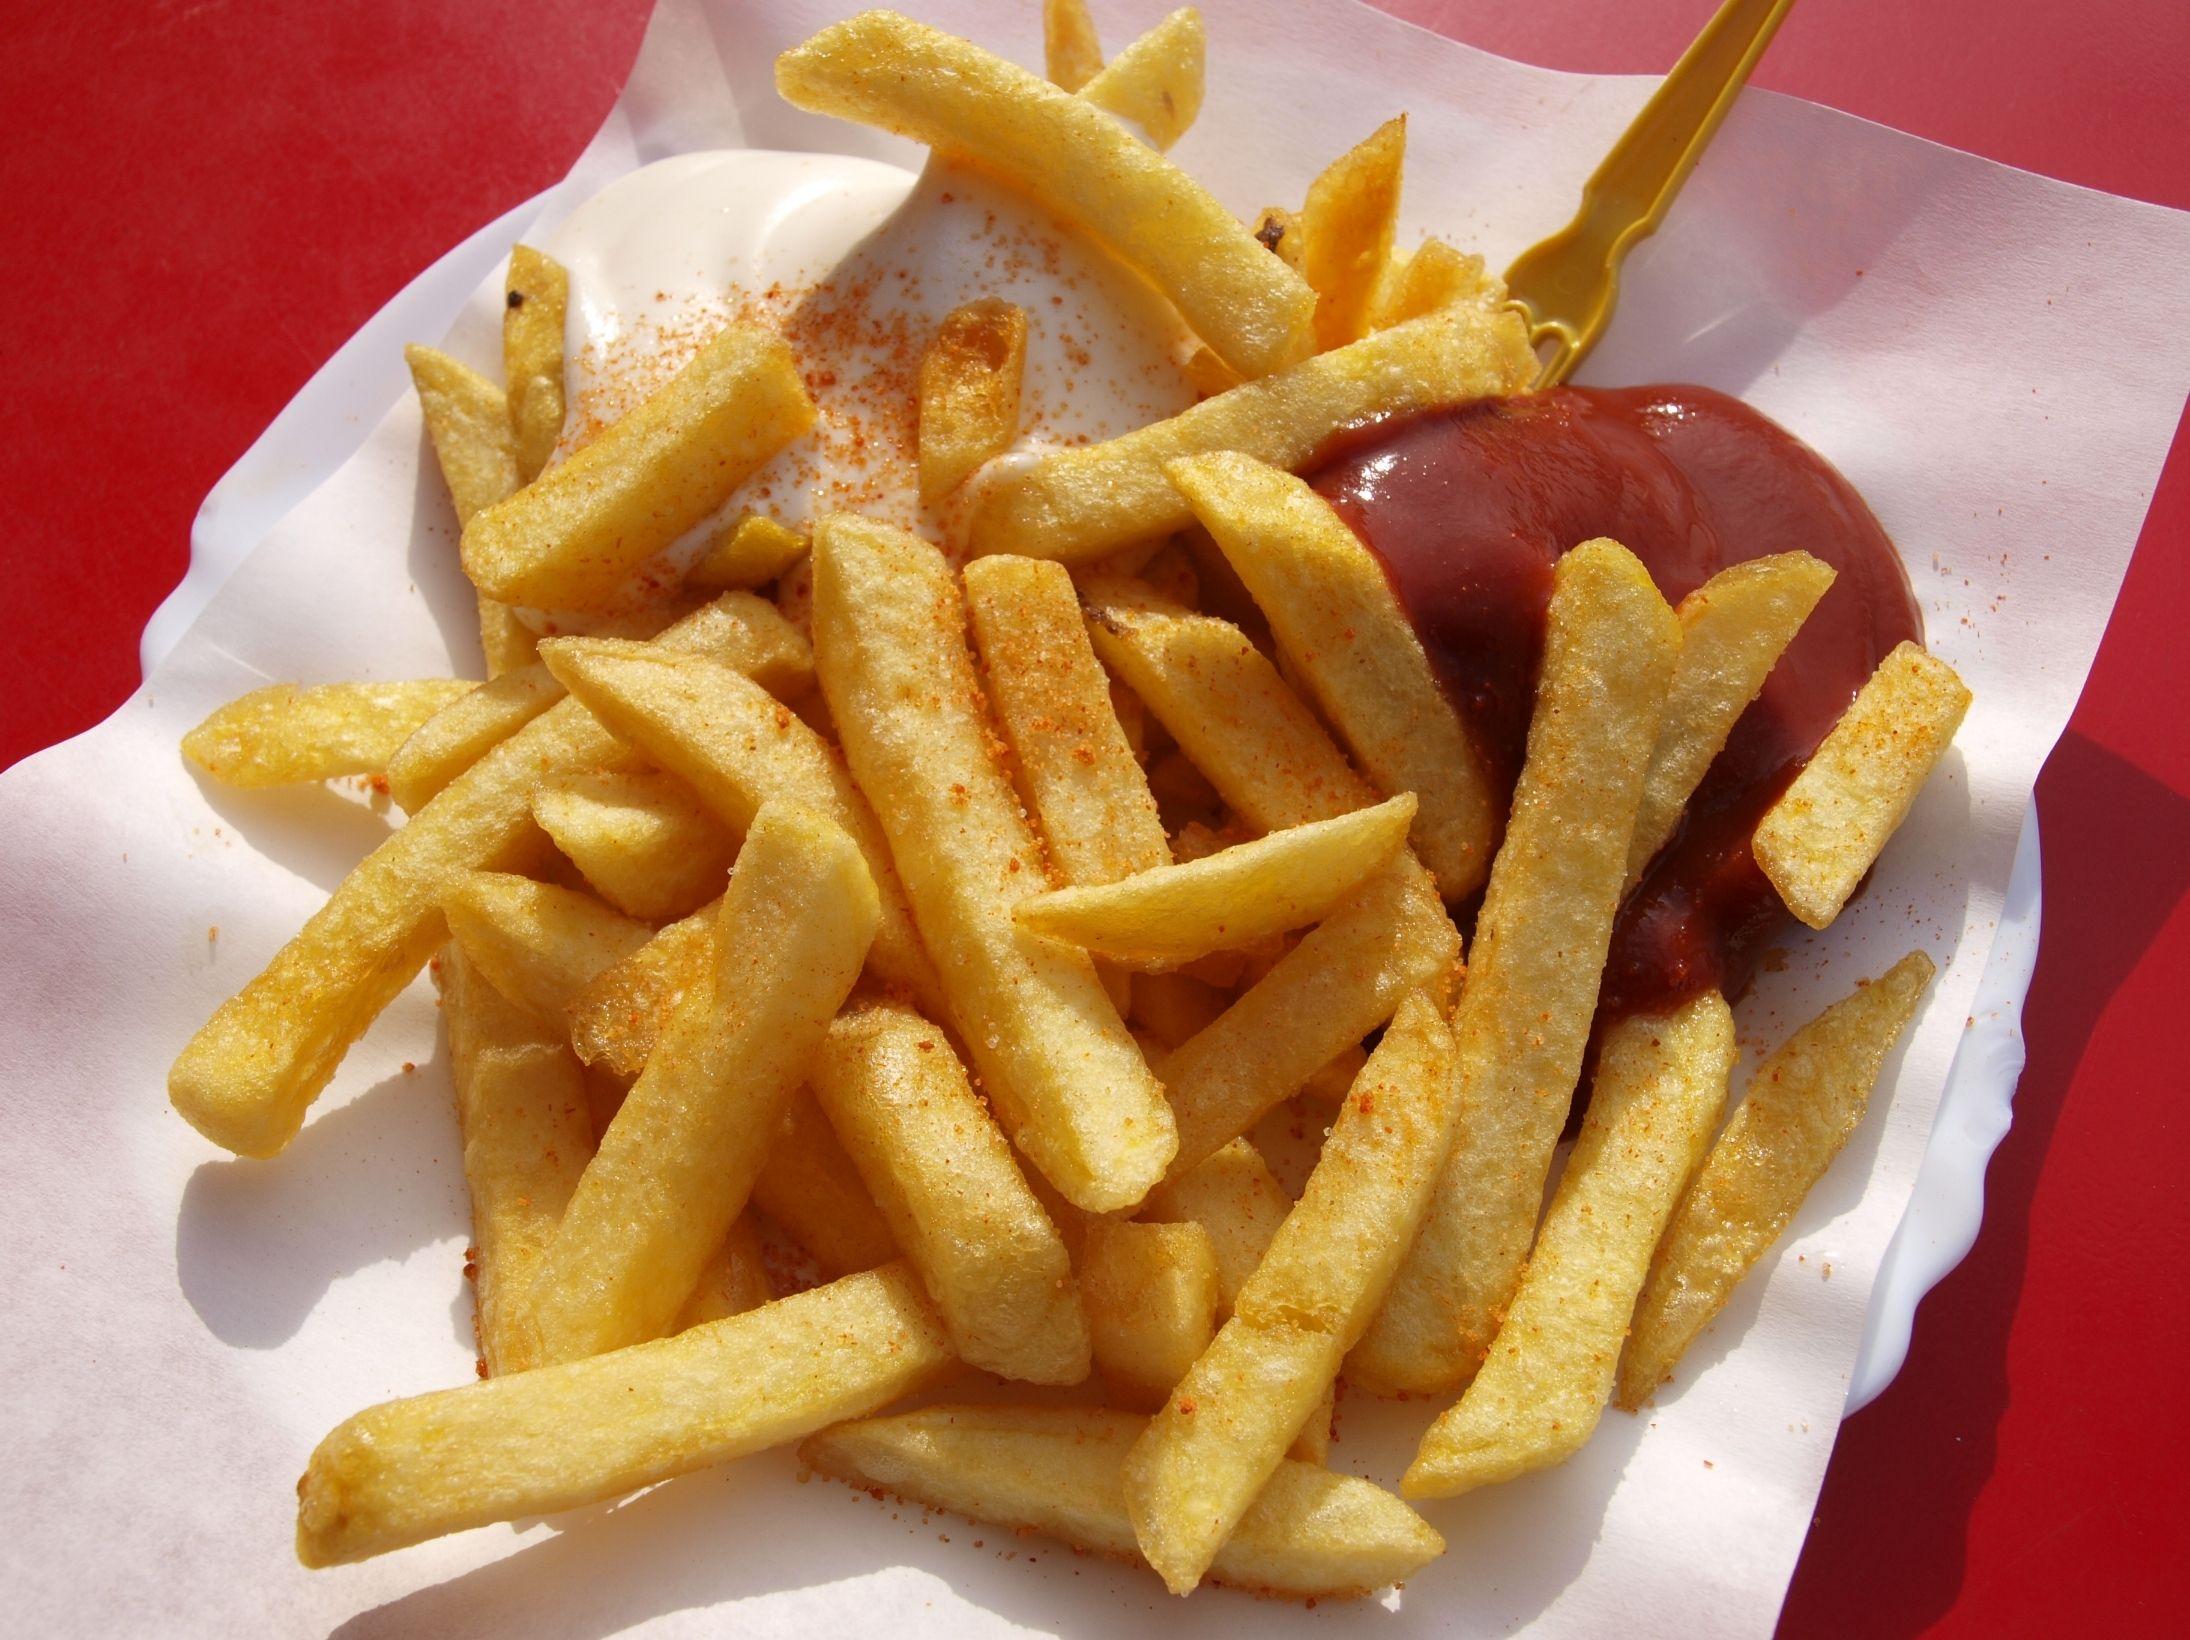 vender batata frita